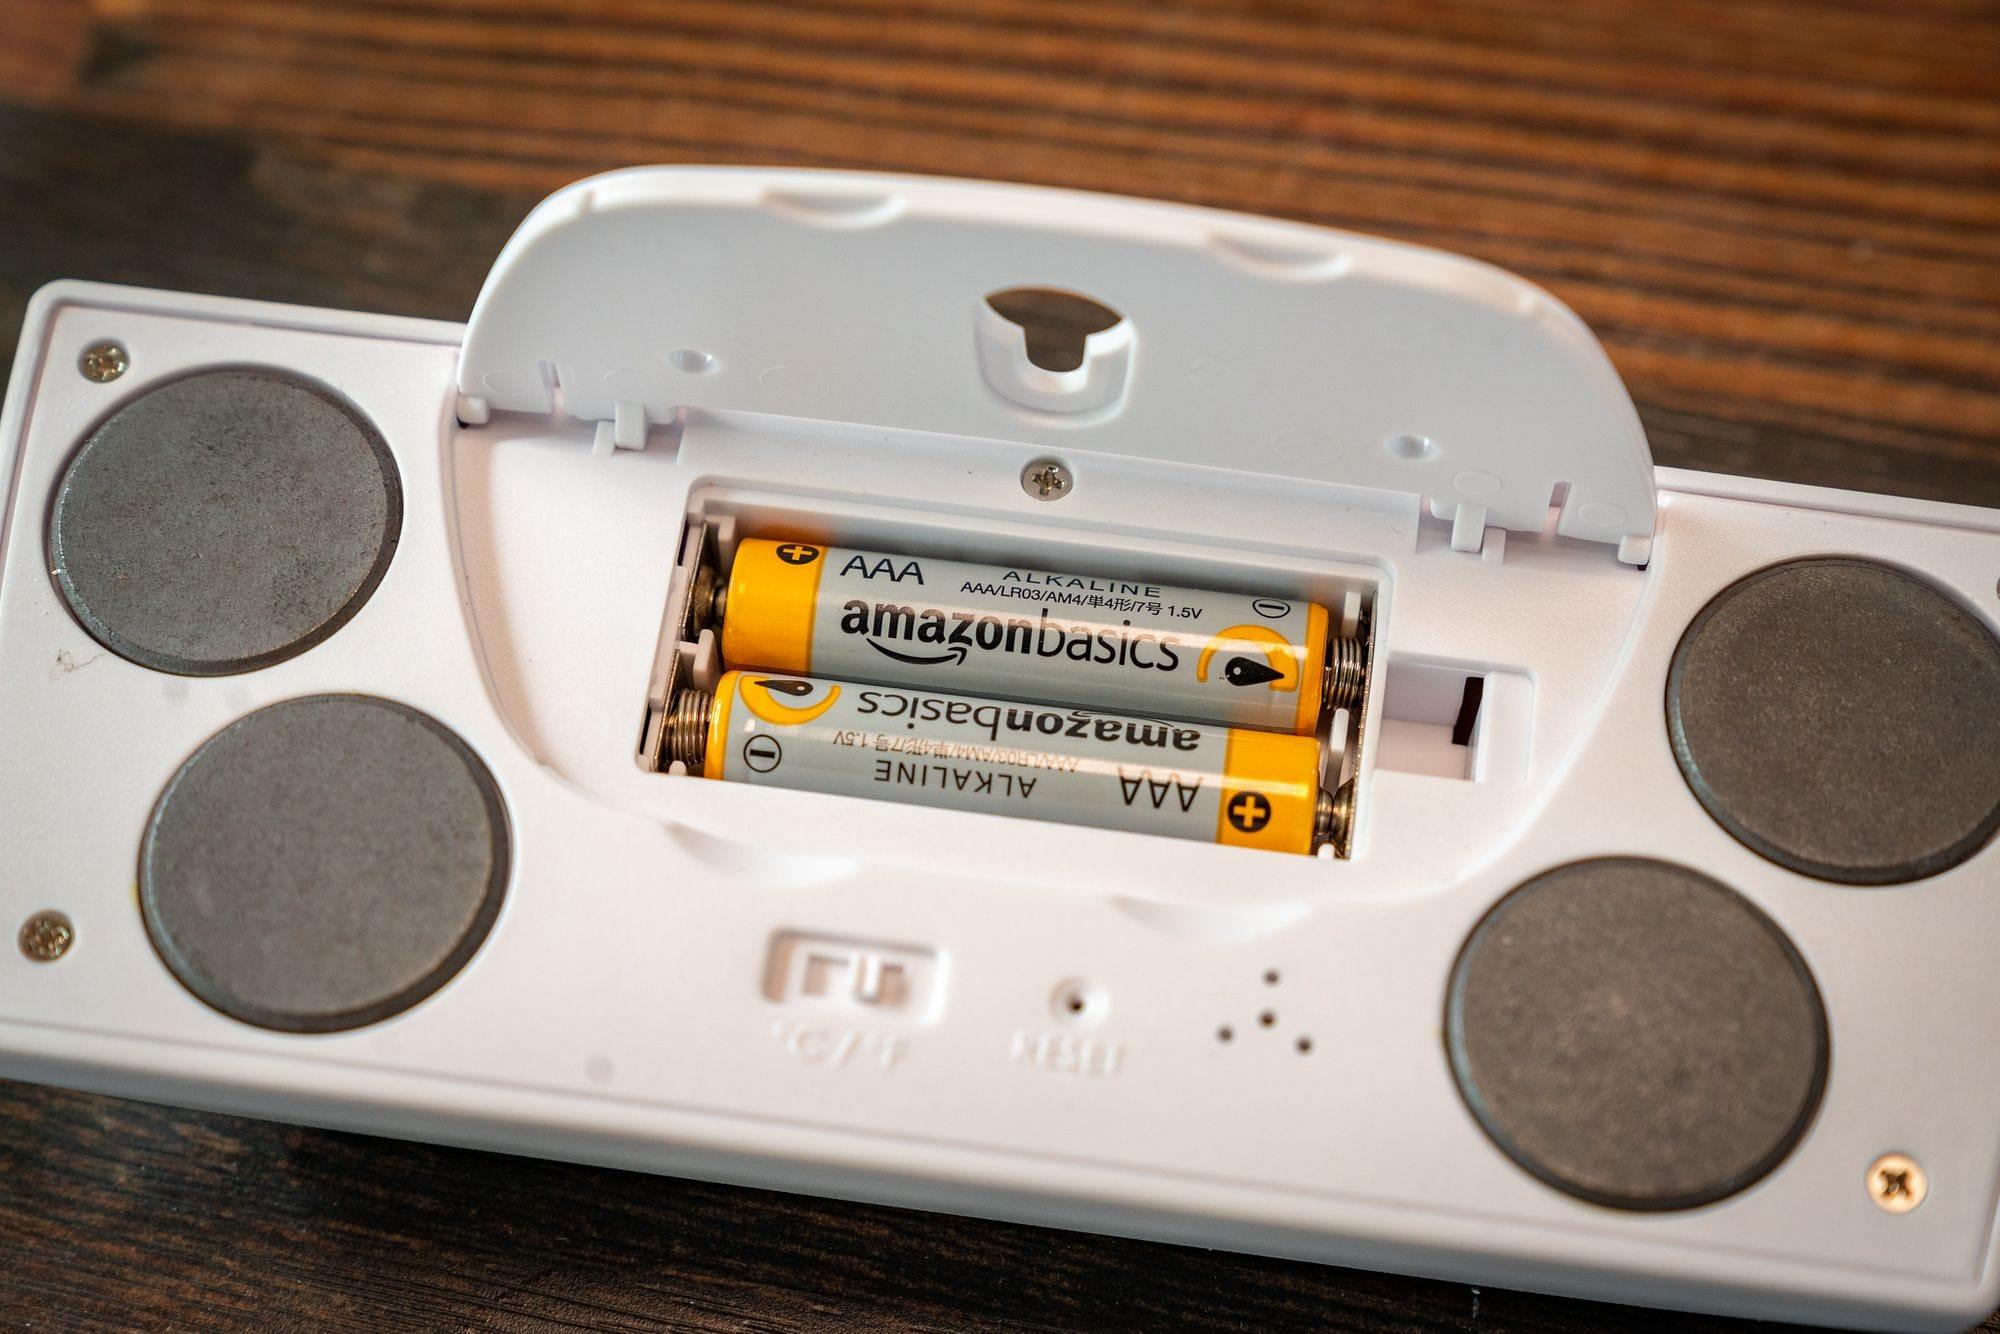 AcuRite 986 AA Batteries